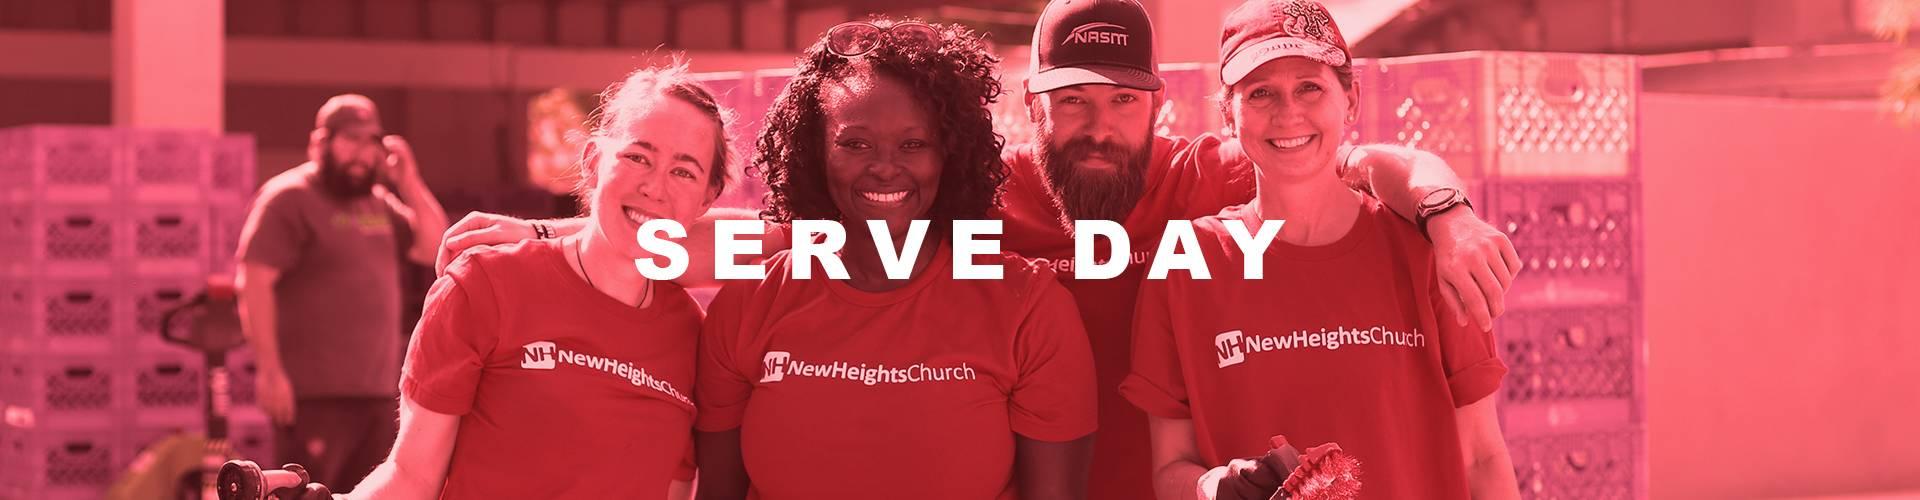 Serve Day Web Banner (1)